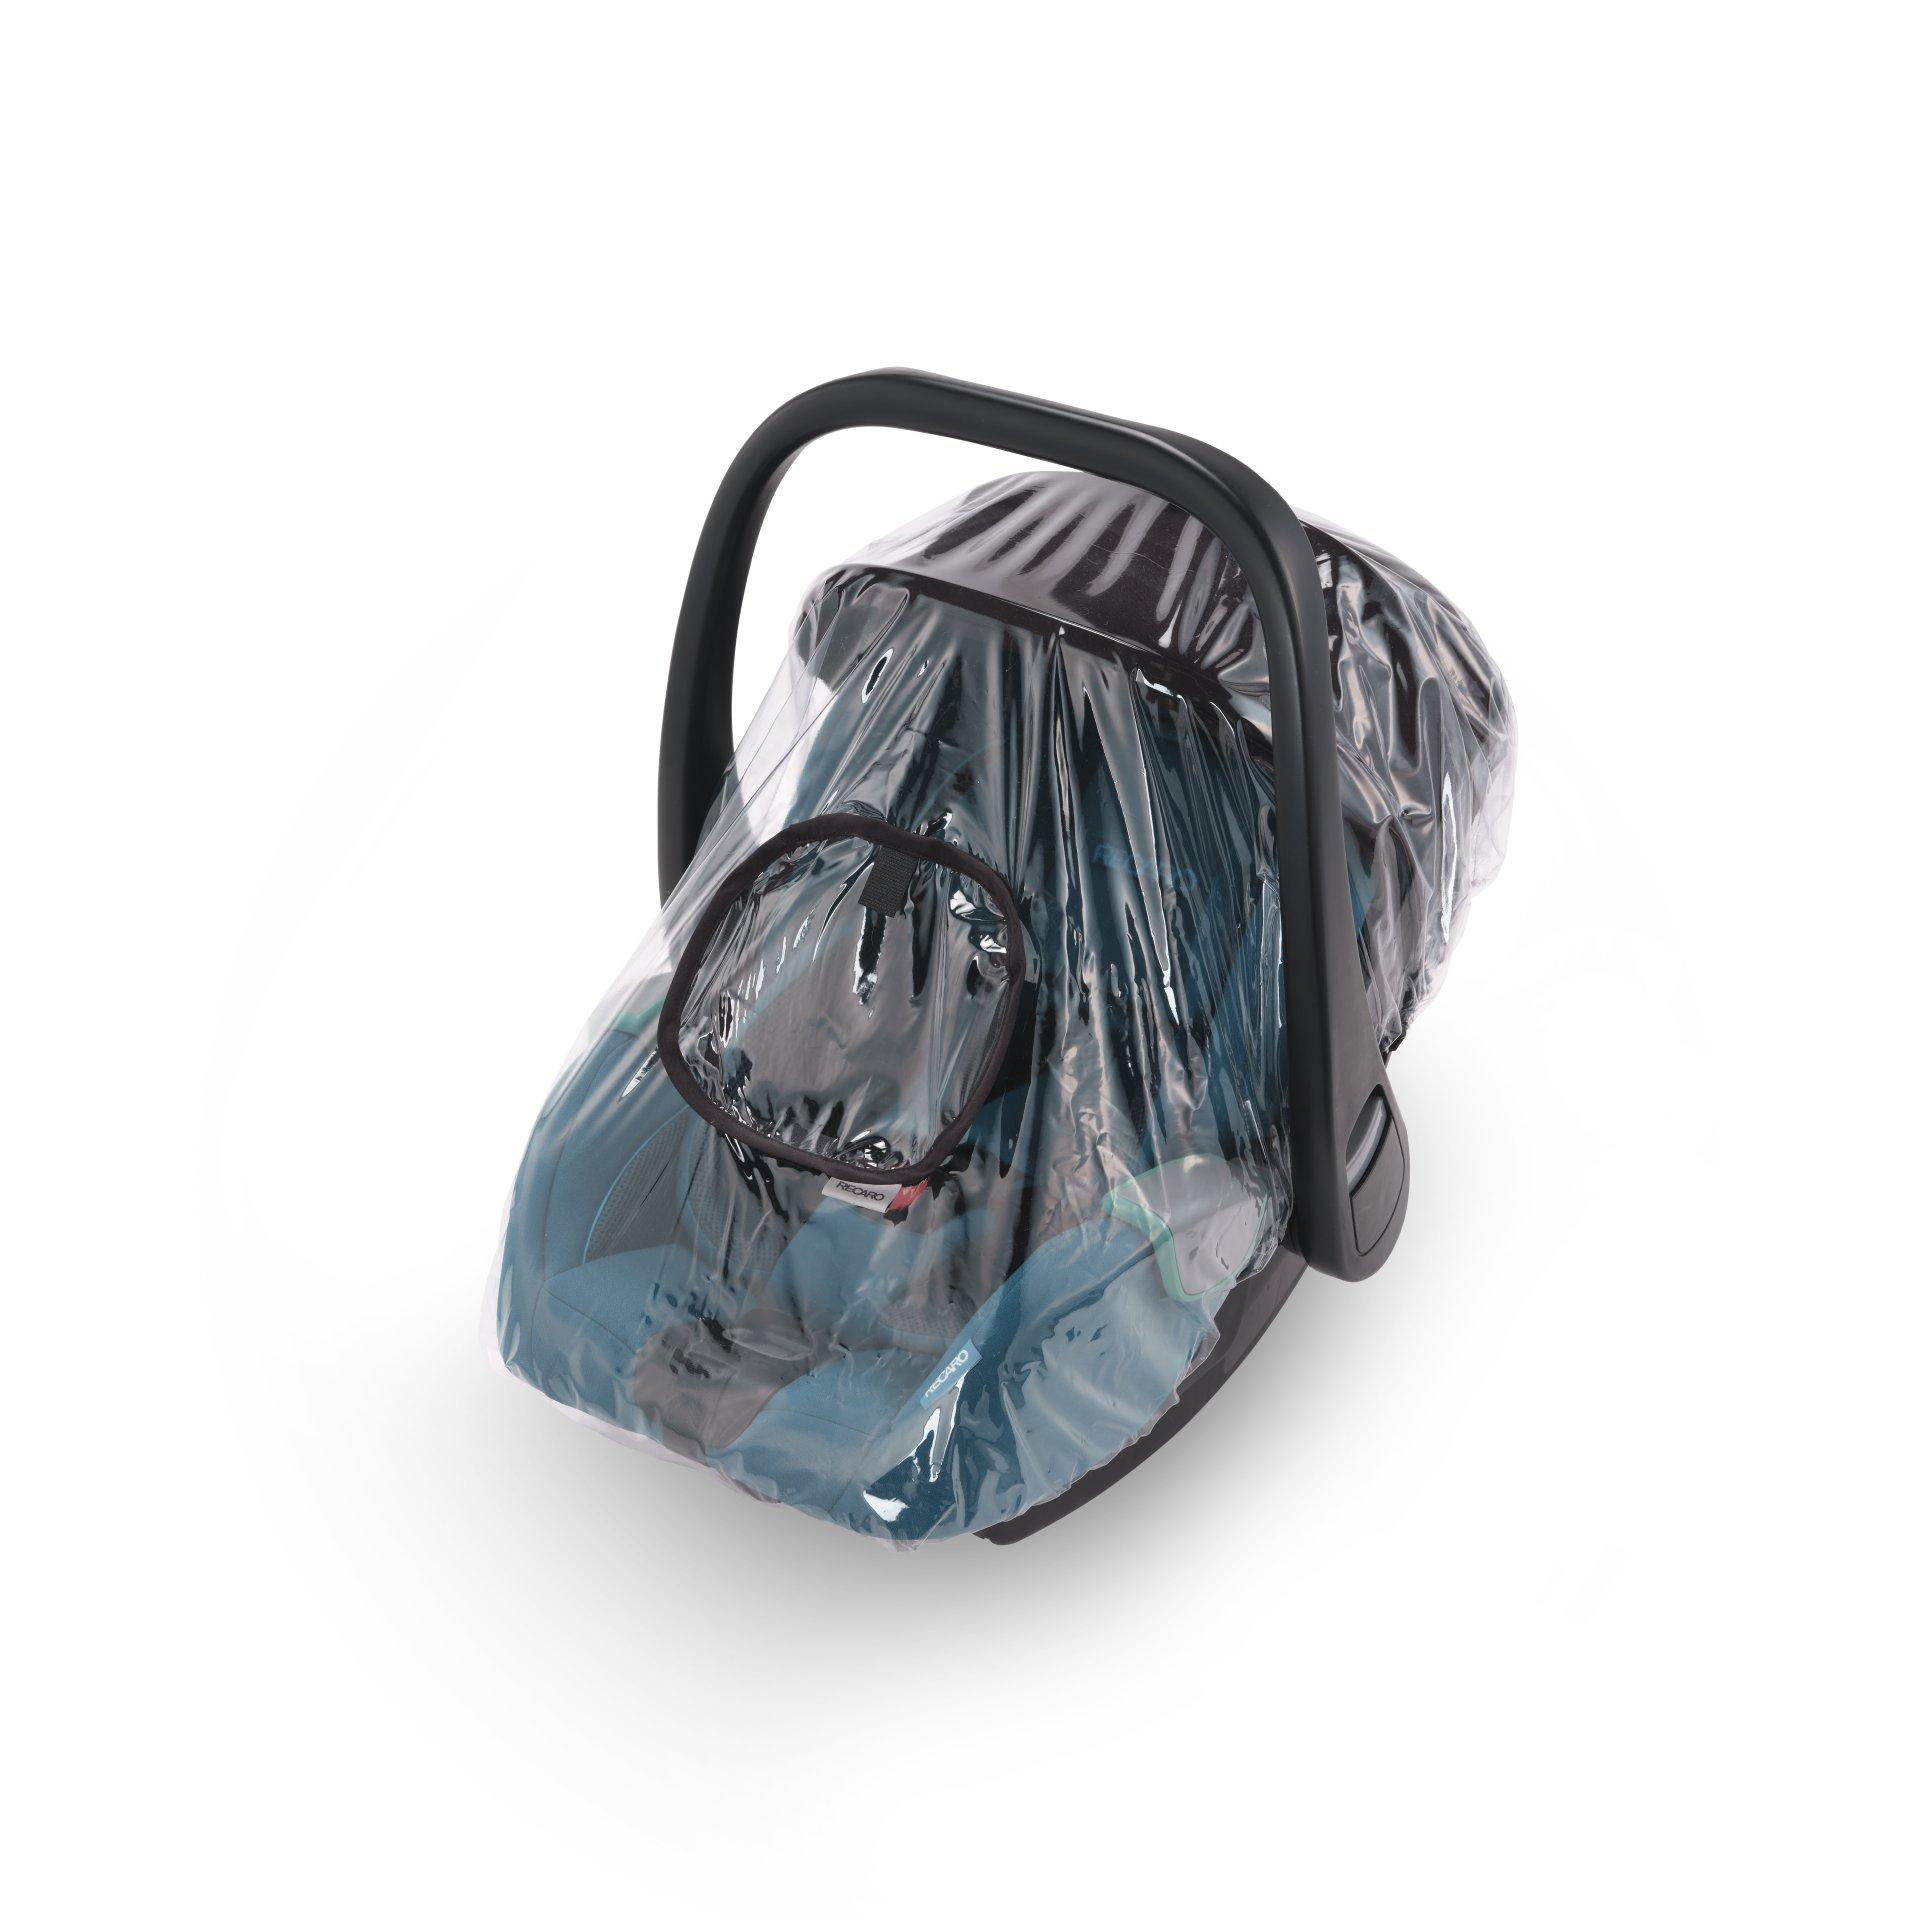 Astounding Recaro Rain Cover For Privia Theyellowbook Wood Chair Design Ideas Theyellowbookinfo